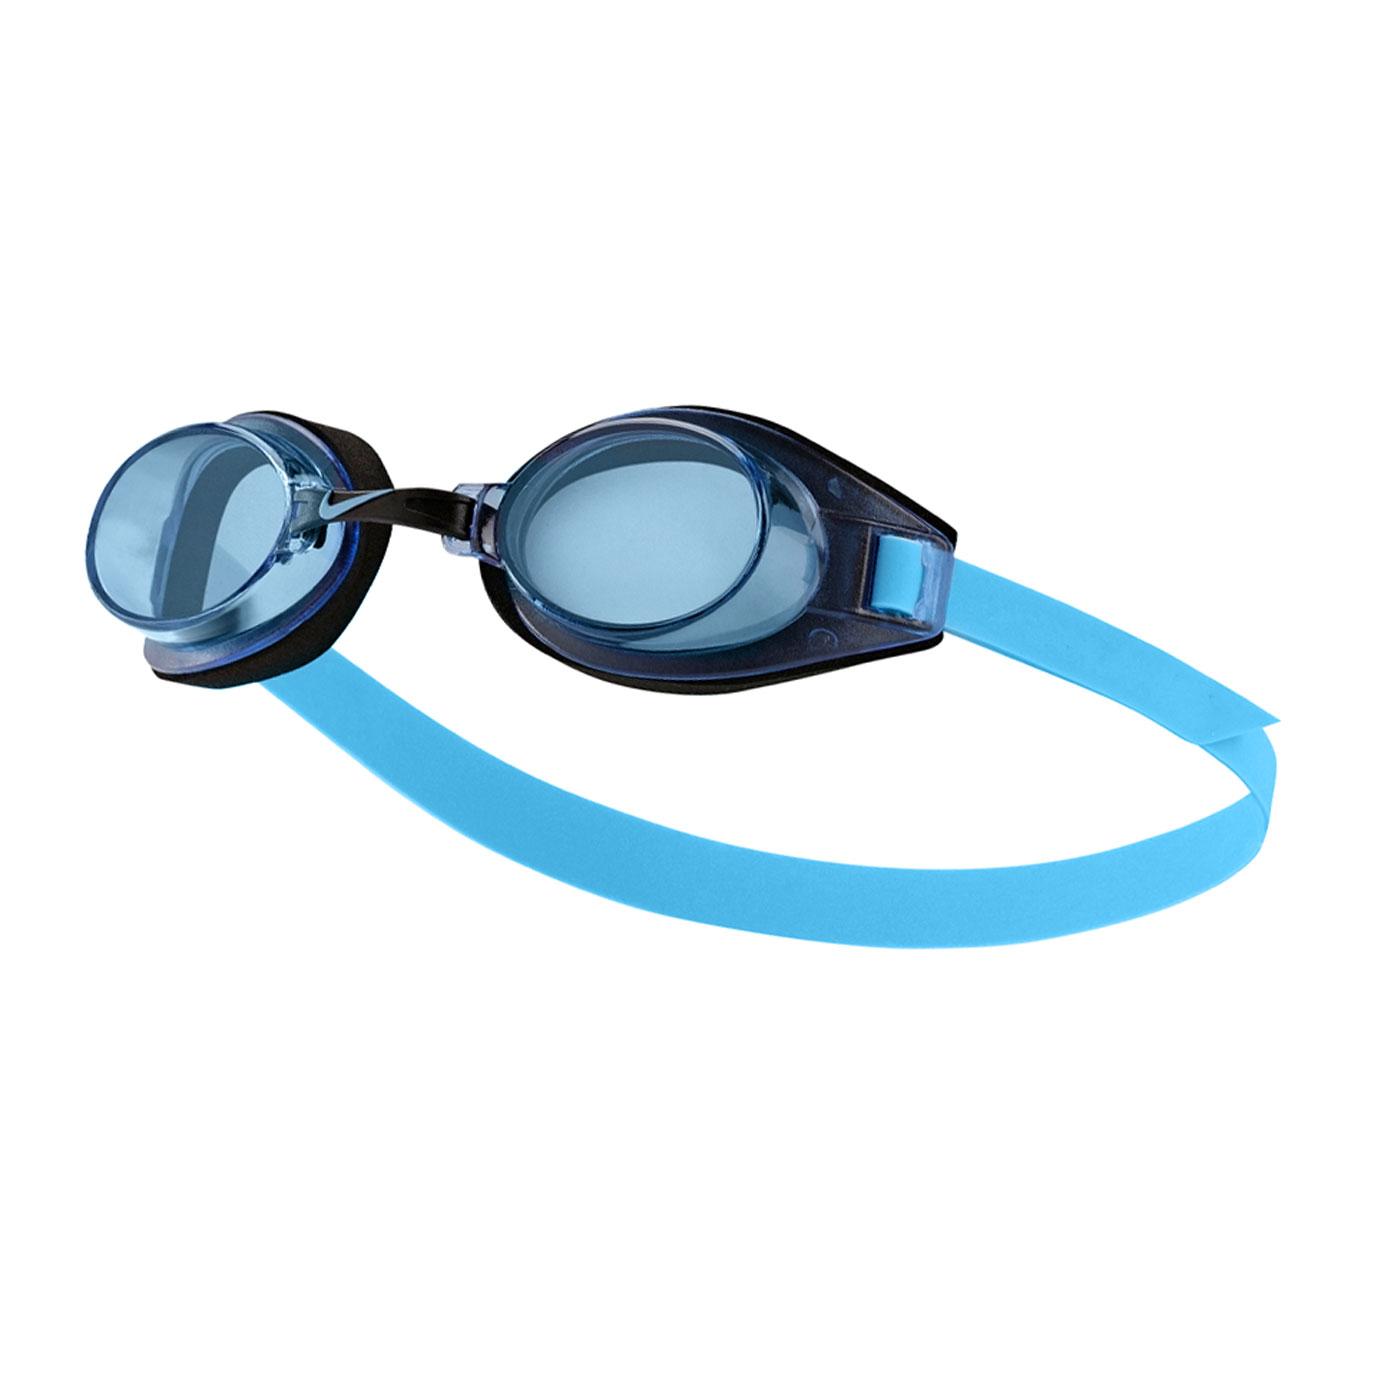 NIKE SWIM 成人休閒型泳鏡 TFSS0555-400